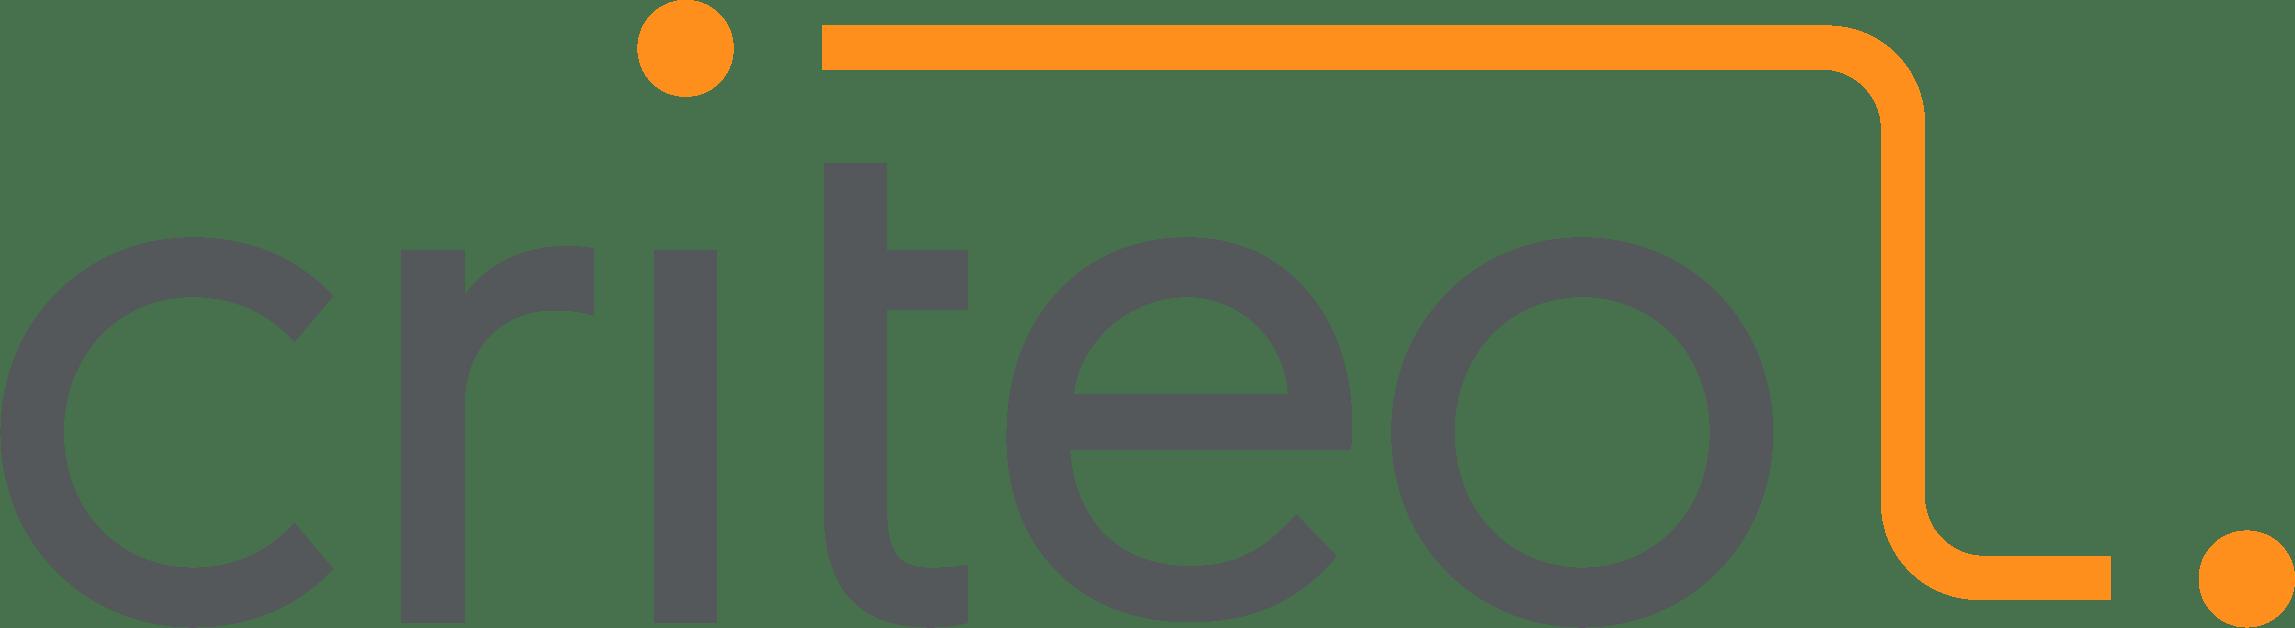 Télephone information entreprise  Criteo